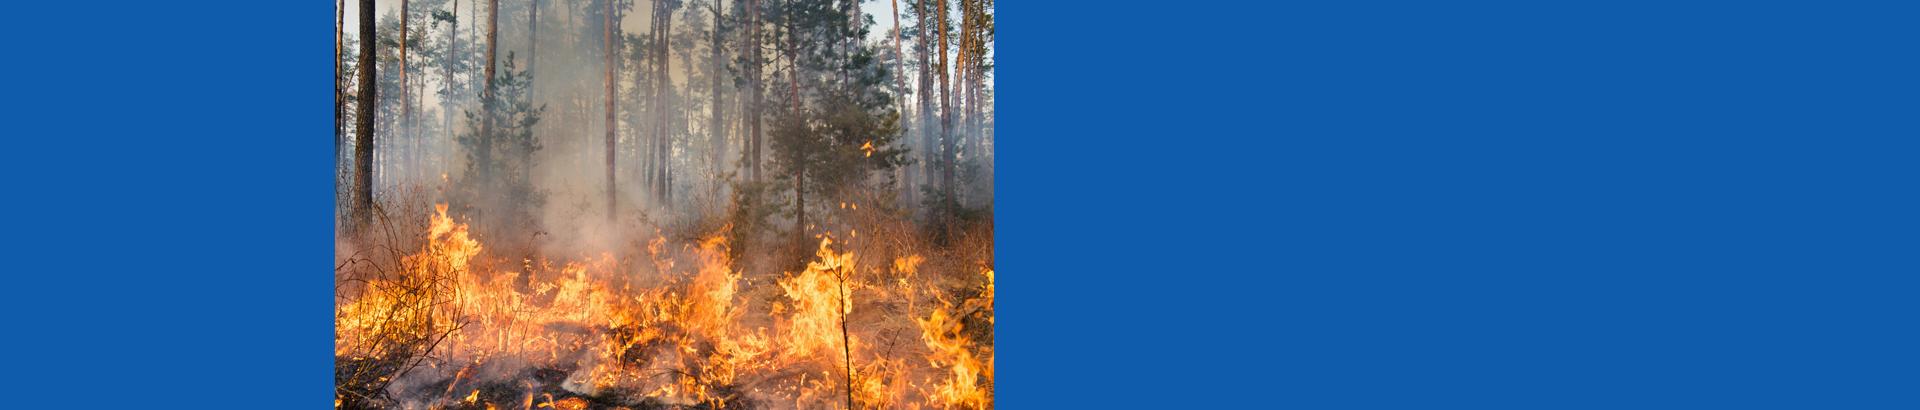 bushfire-front-1